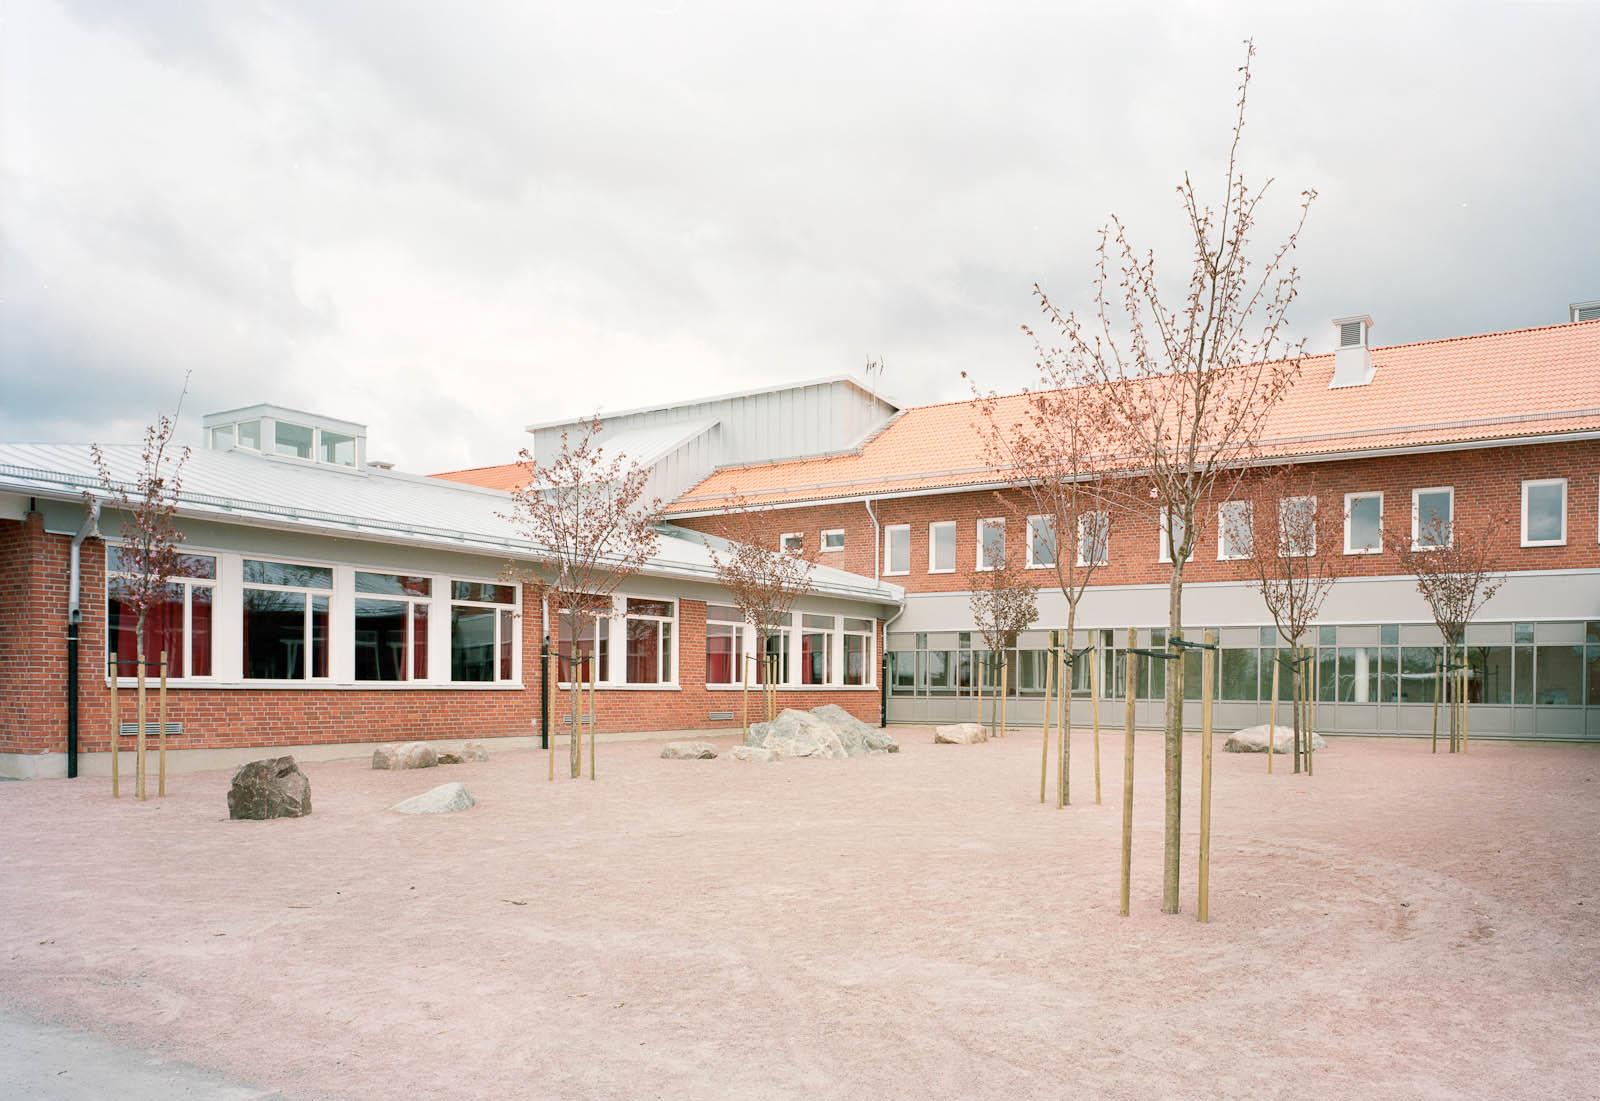 Skolbyggnad. Marjetica Potrc och STEALTH, Fruit and Energy Farms in a Public